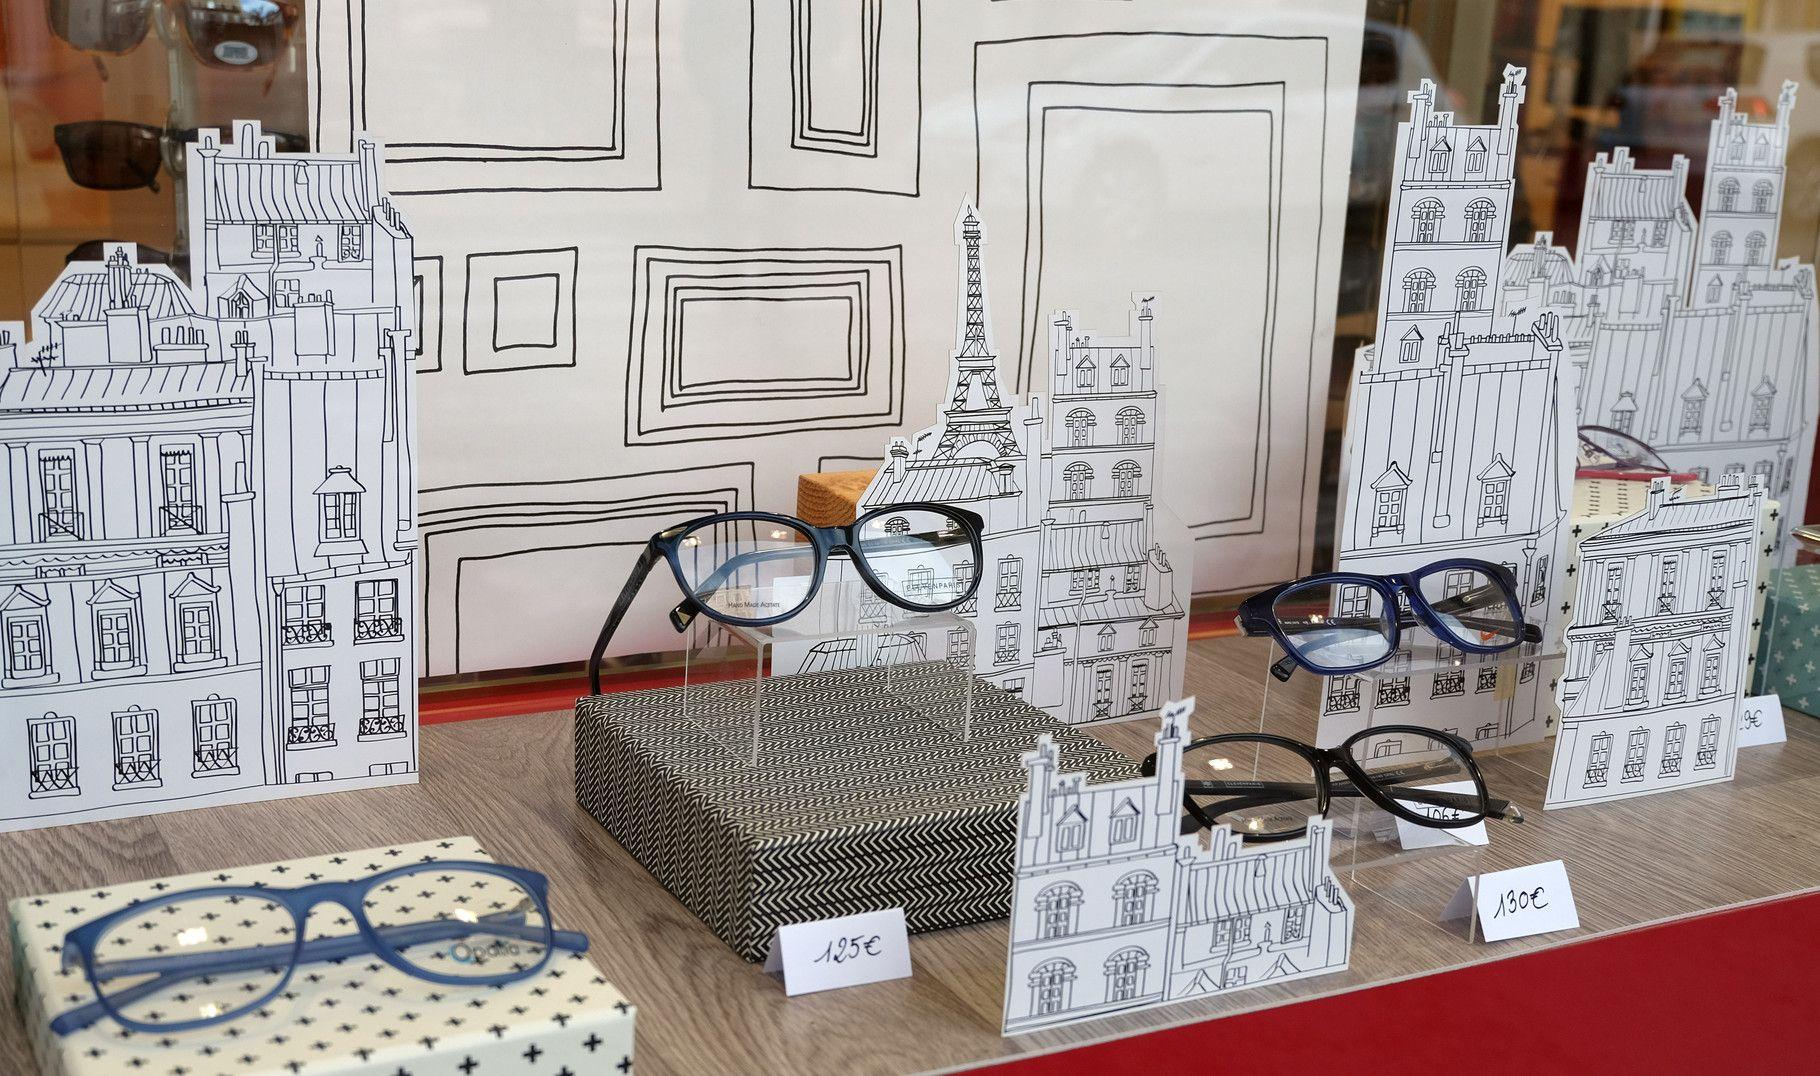 vitrines la belle id e my work pinterest vitrines la belle et optique. Black Bedroom Furniture Sets. Home Design Ideas